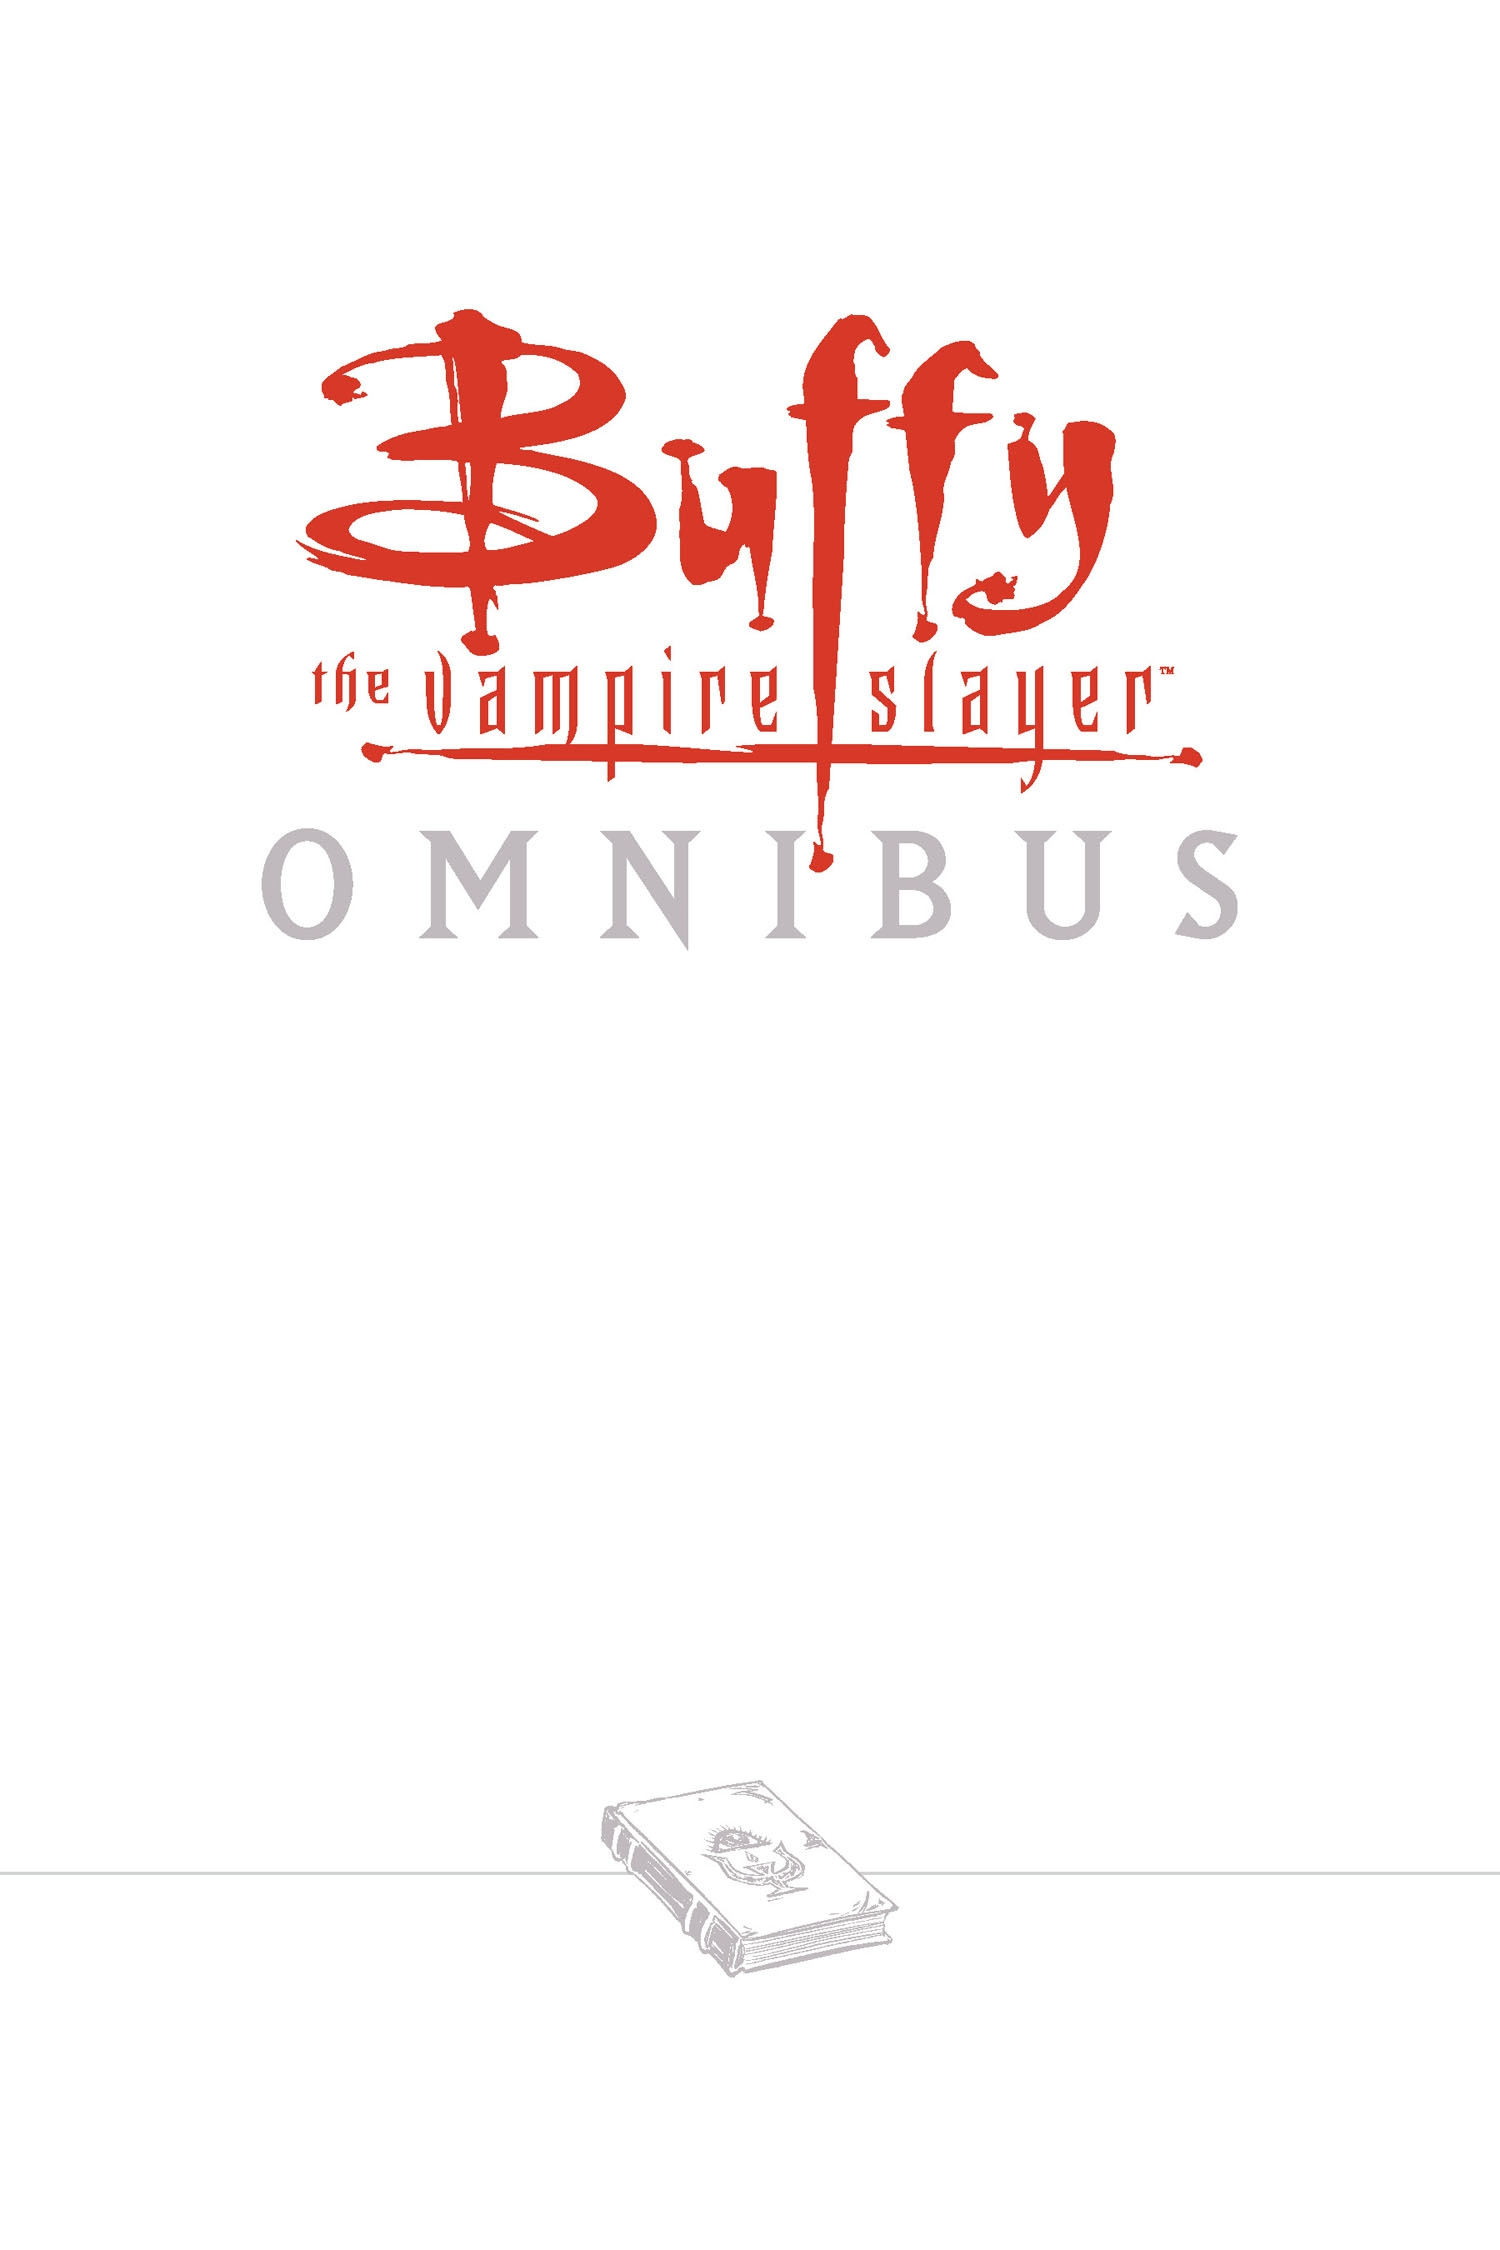 Read online Buffy the Vampire Slayer: Omnibus comic -  Issue # TPB 2 - 2